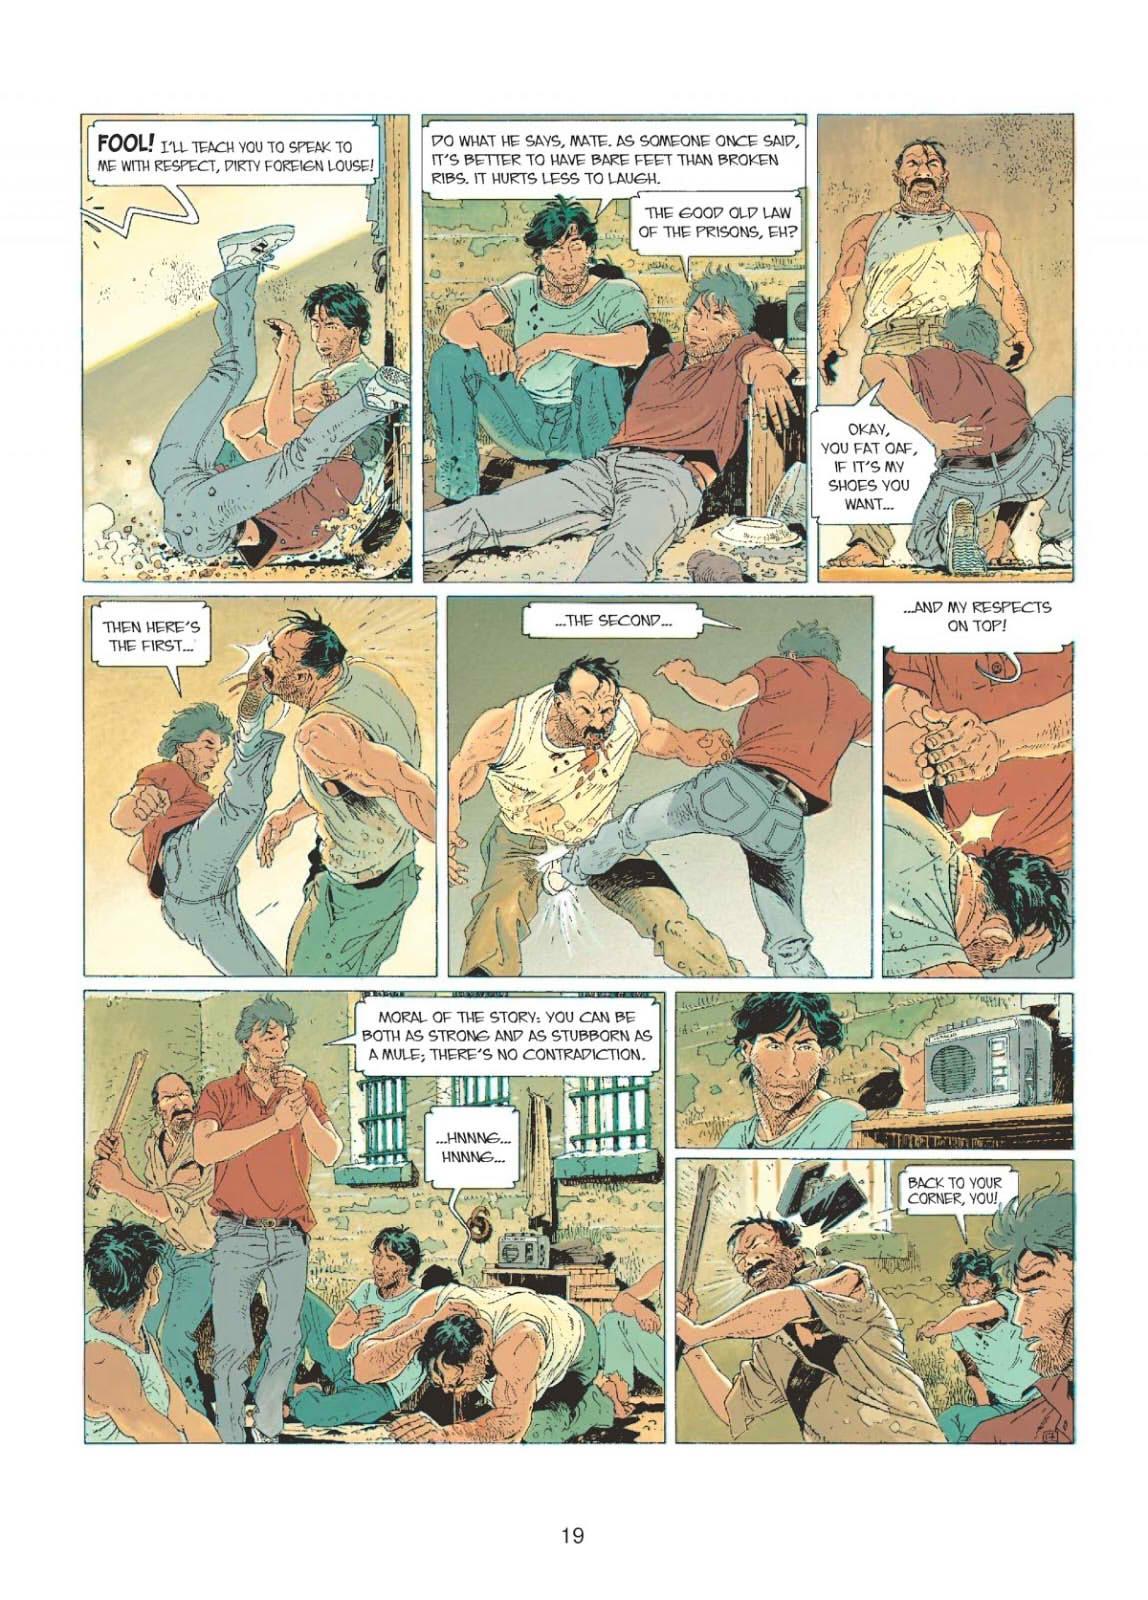 Comic ballbusting Castration Ballbusting